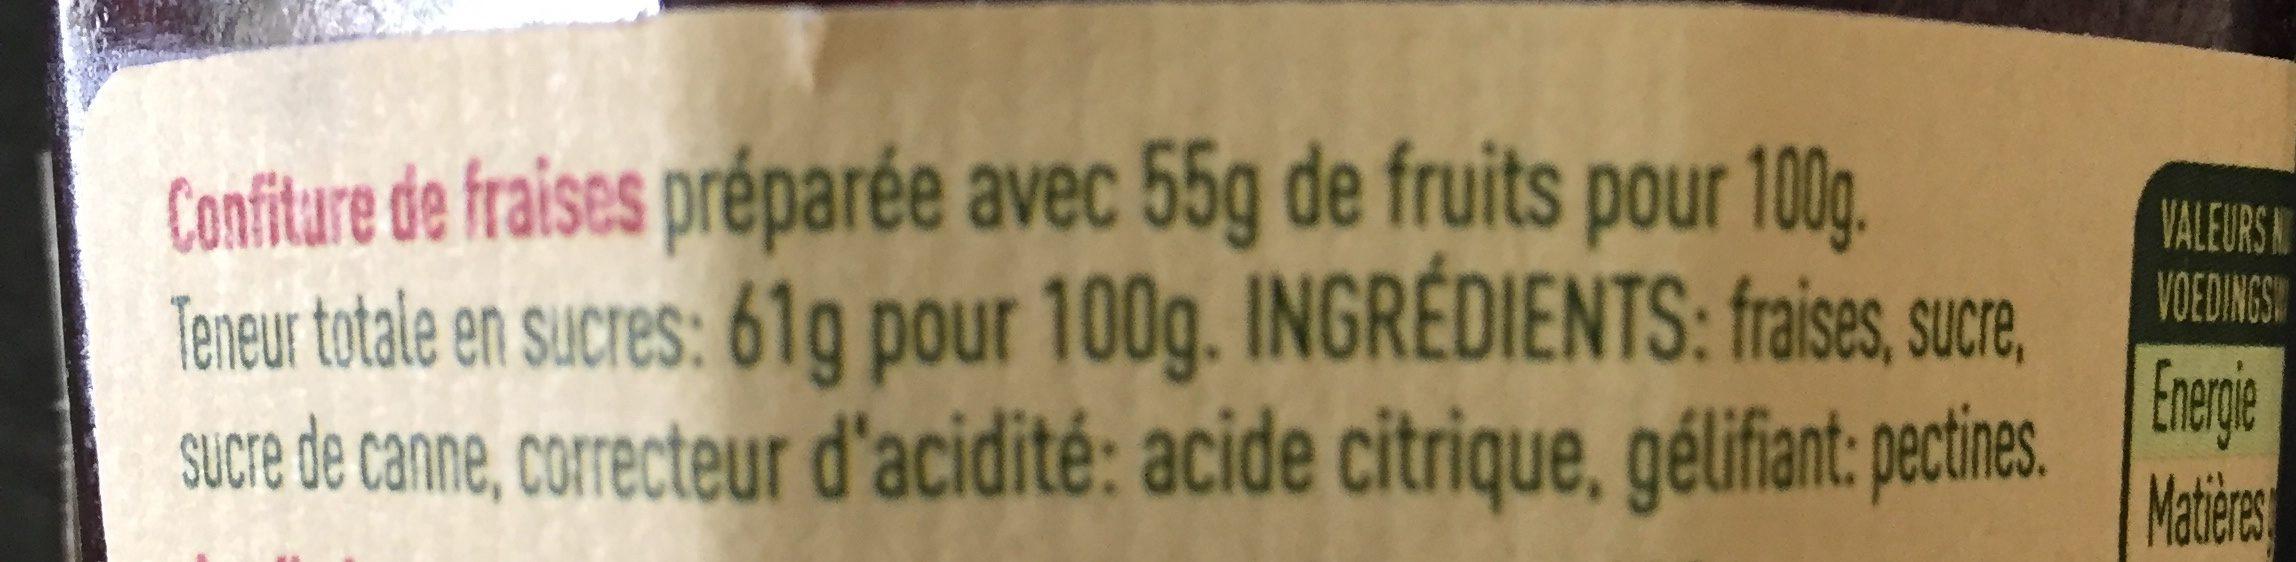 Confiture De Fraises, Nostalgie, 265 Grammes, Marque Materne - Ingrediënten - fr